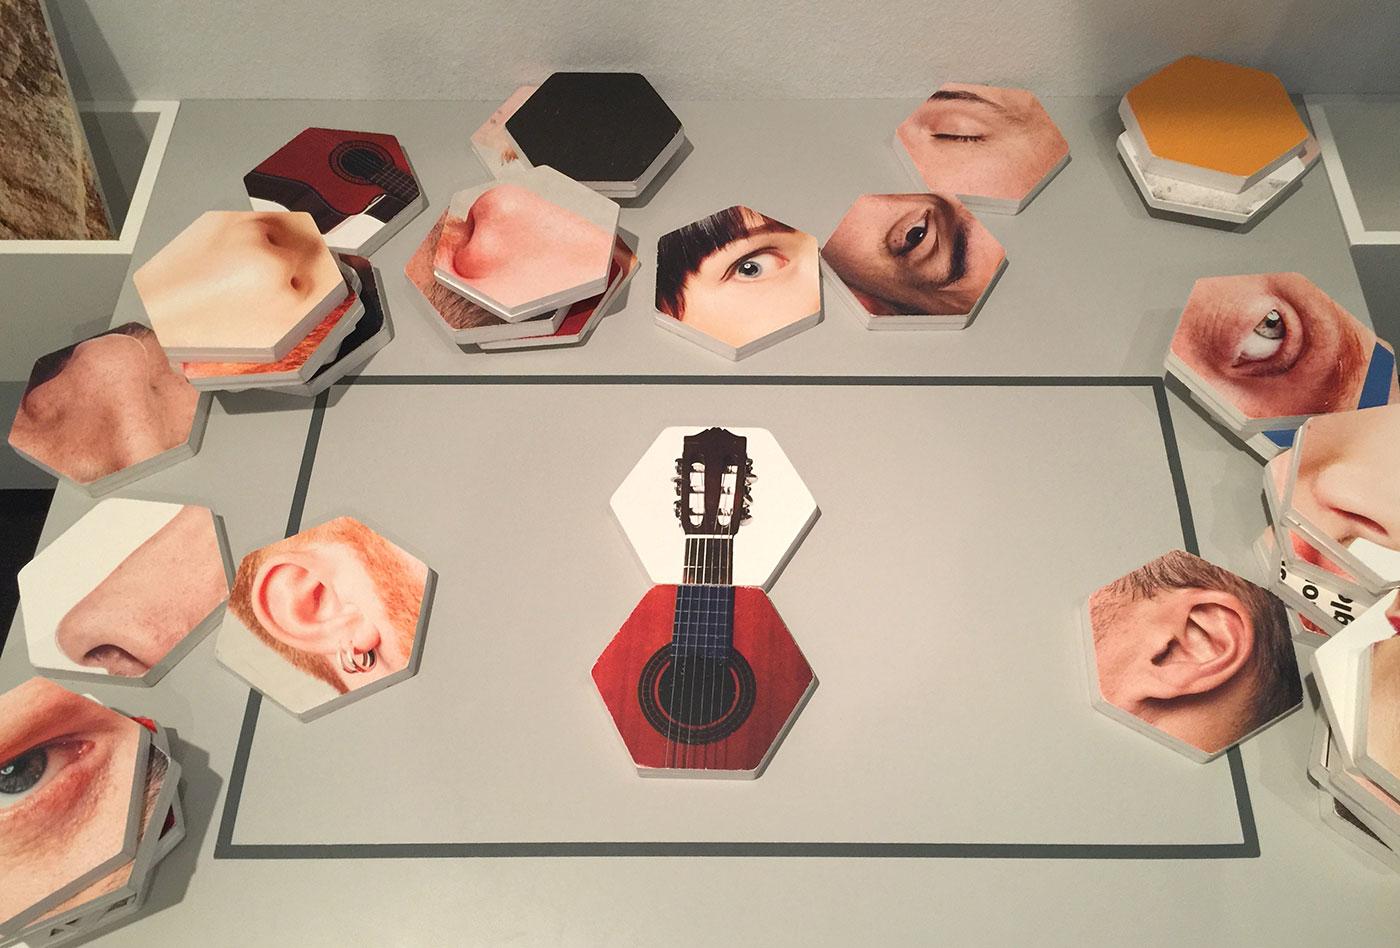 interactiu-articinema-caixaforum-barcelona-exposicio